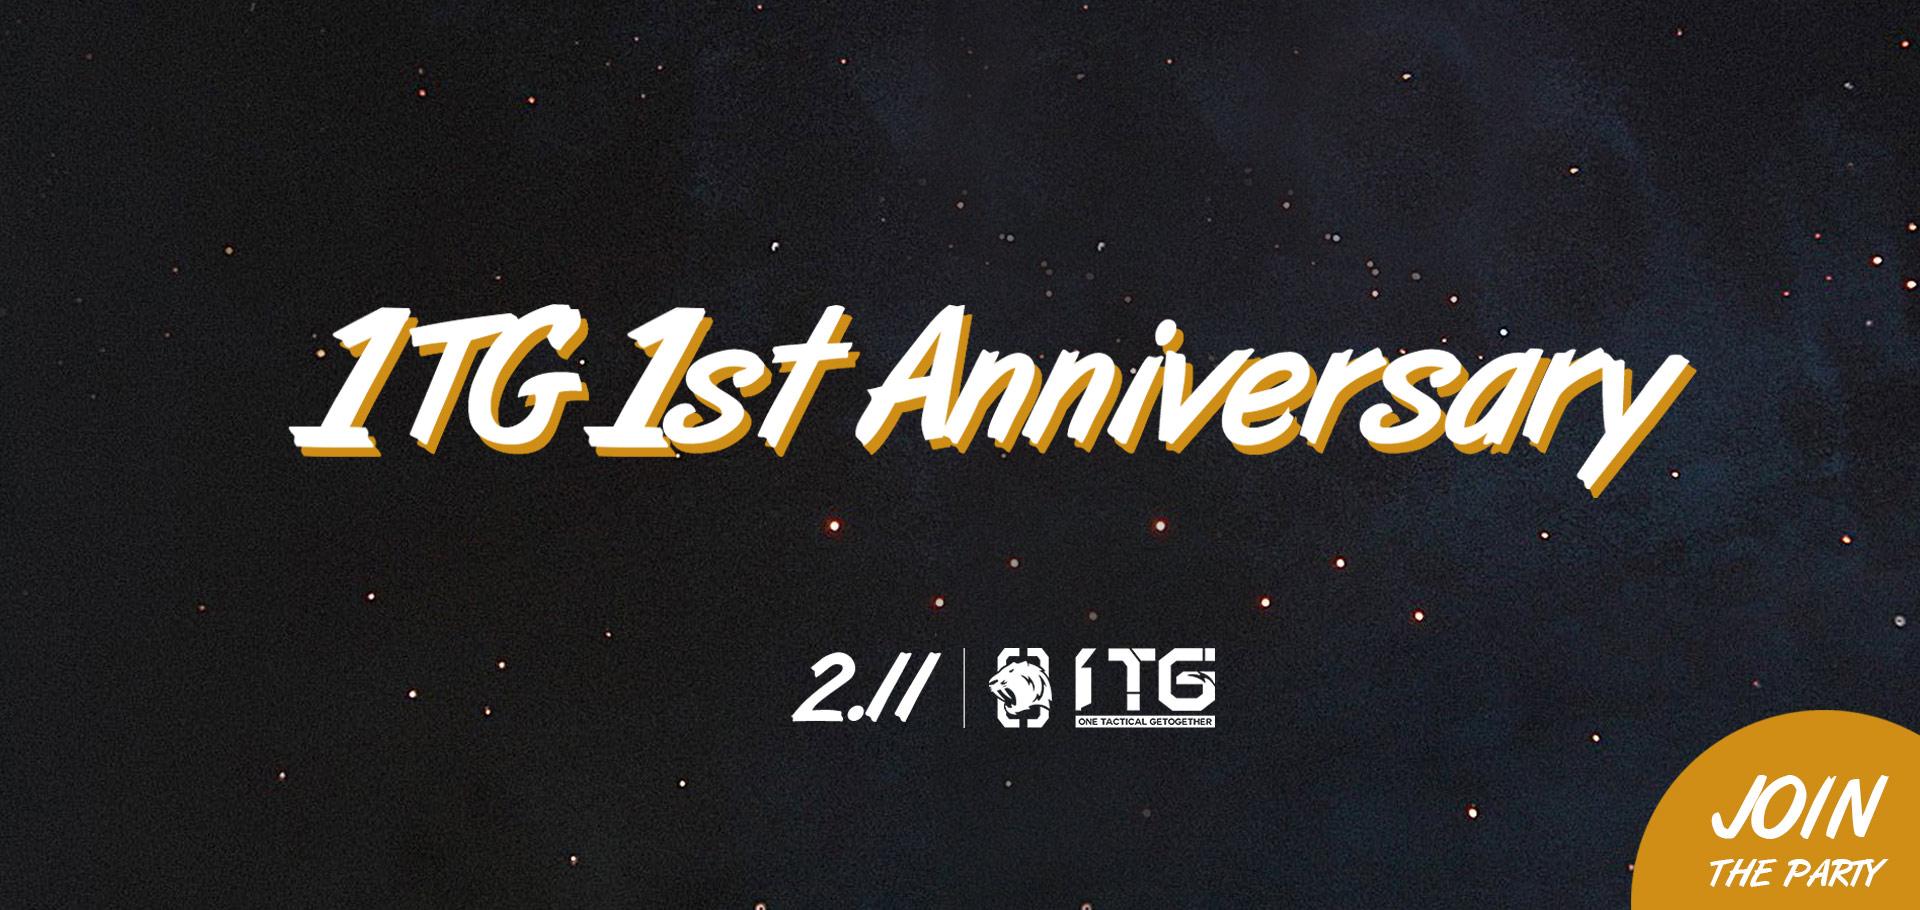 1TG 1st Anniversary, 1TG, 1st, Anniversary, 1st Anniversary